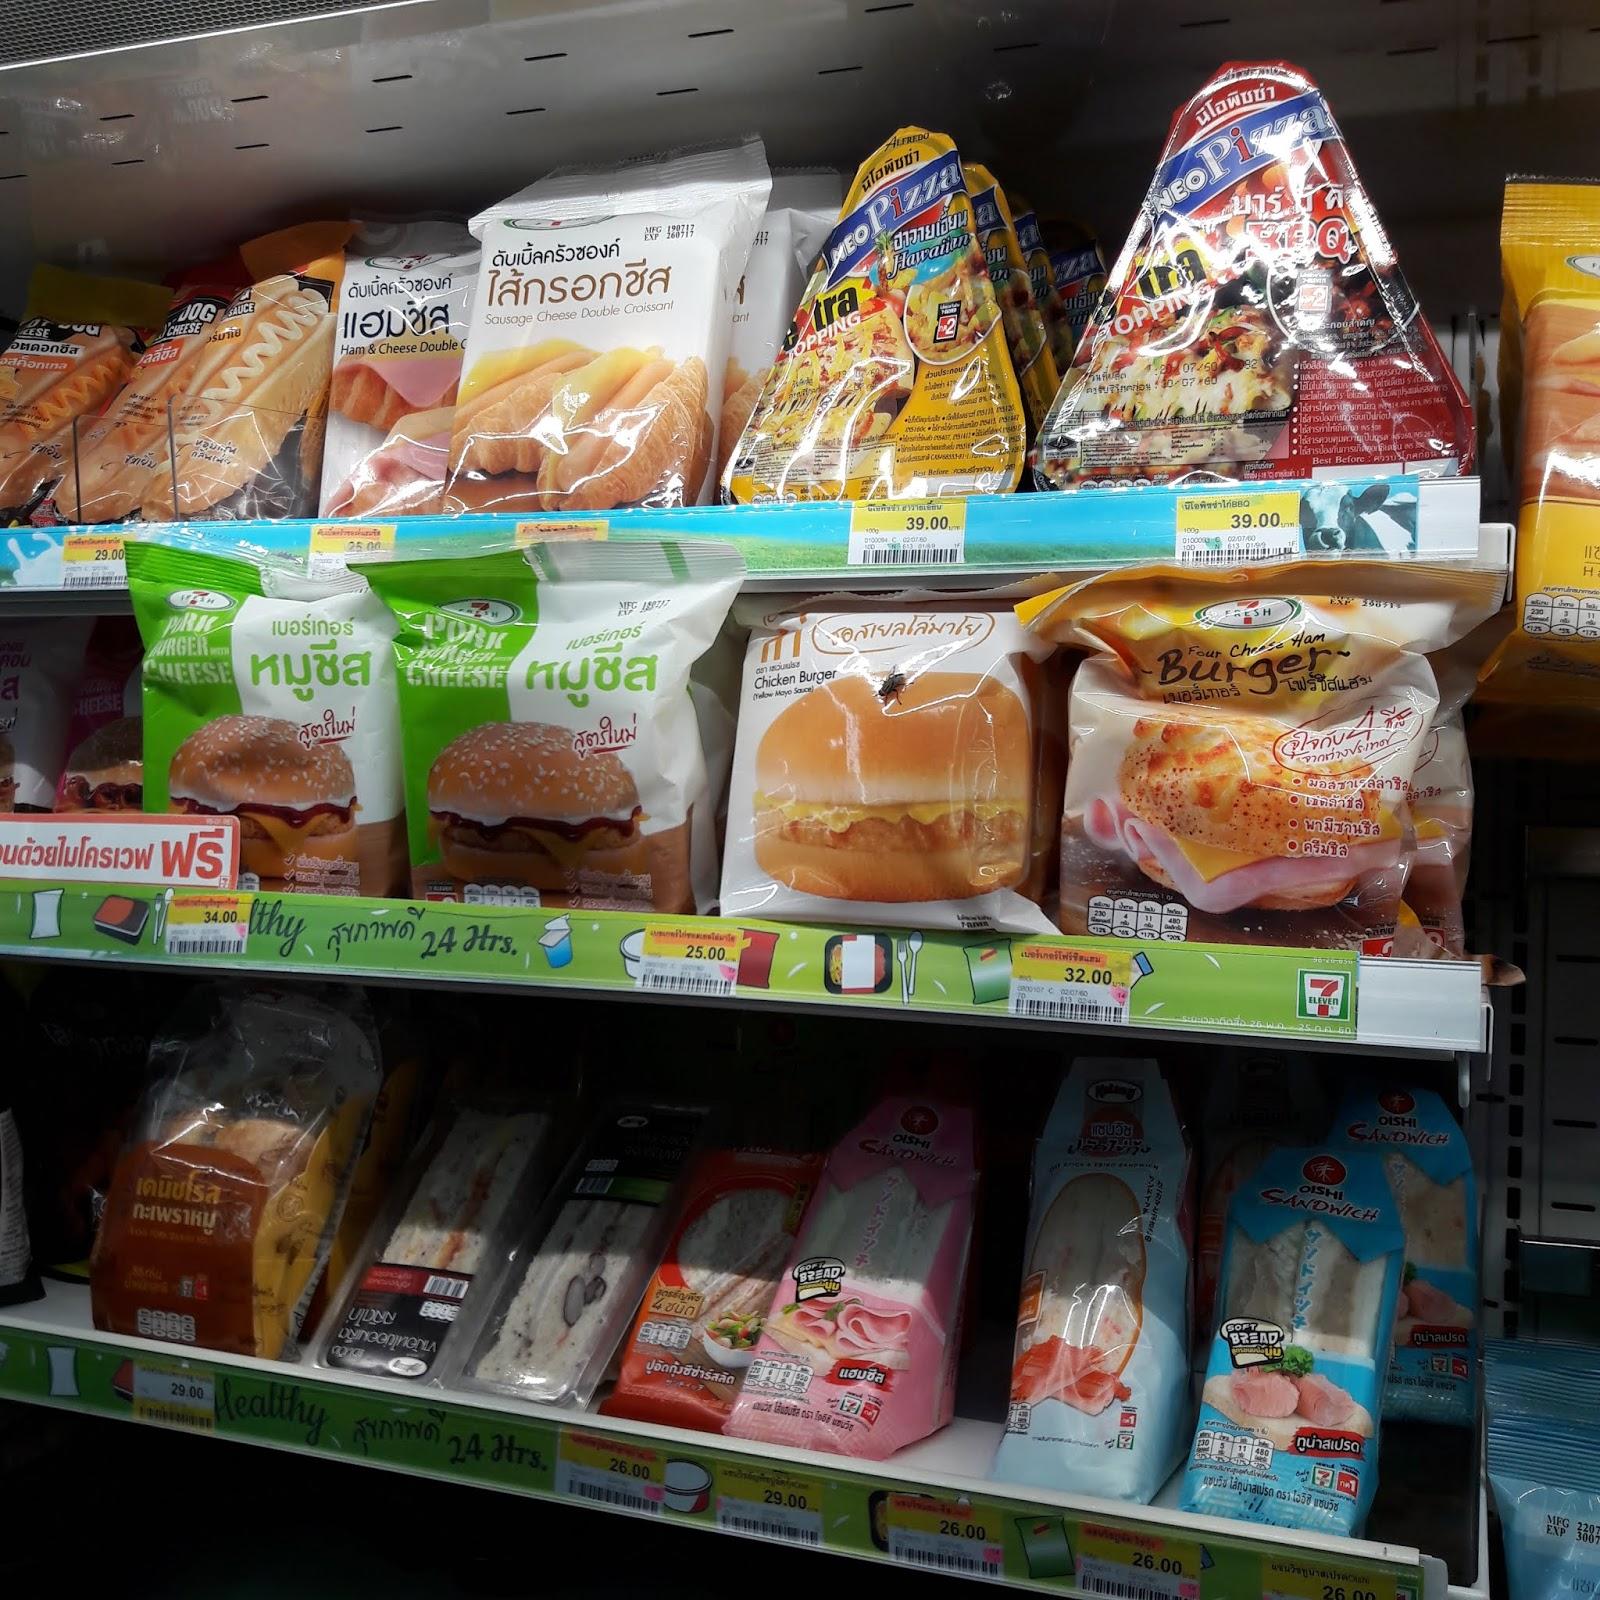 Diari Benny Makanan Ringan Yang Istimewa Di 7 11 Thailand Part I